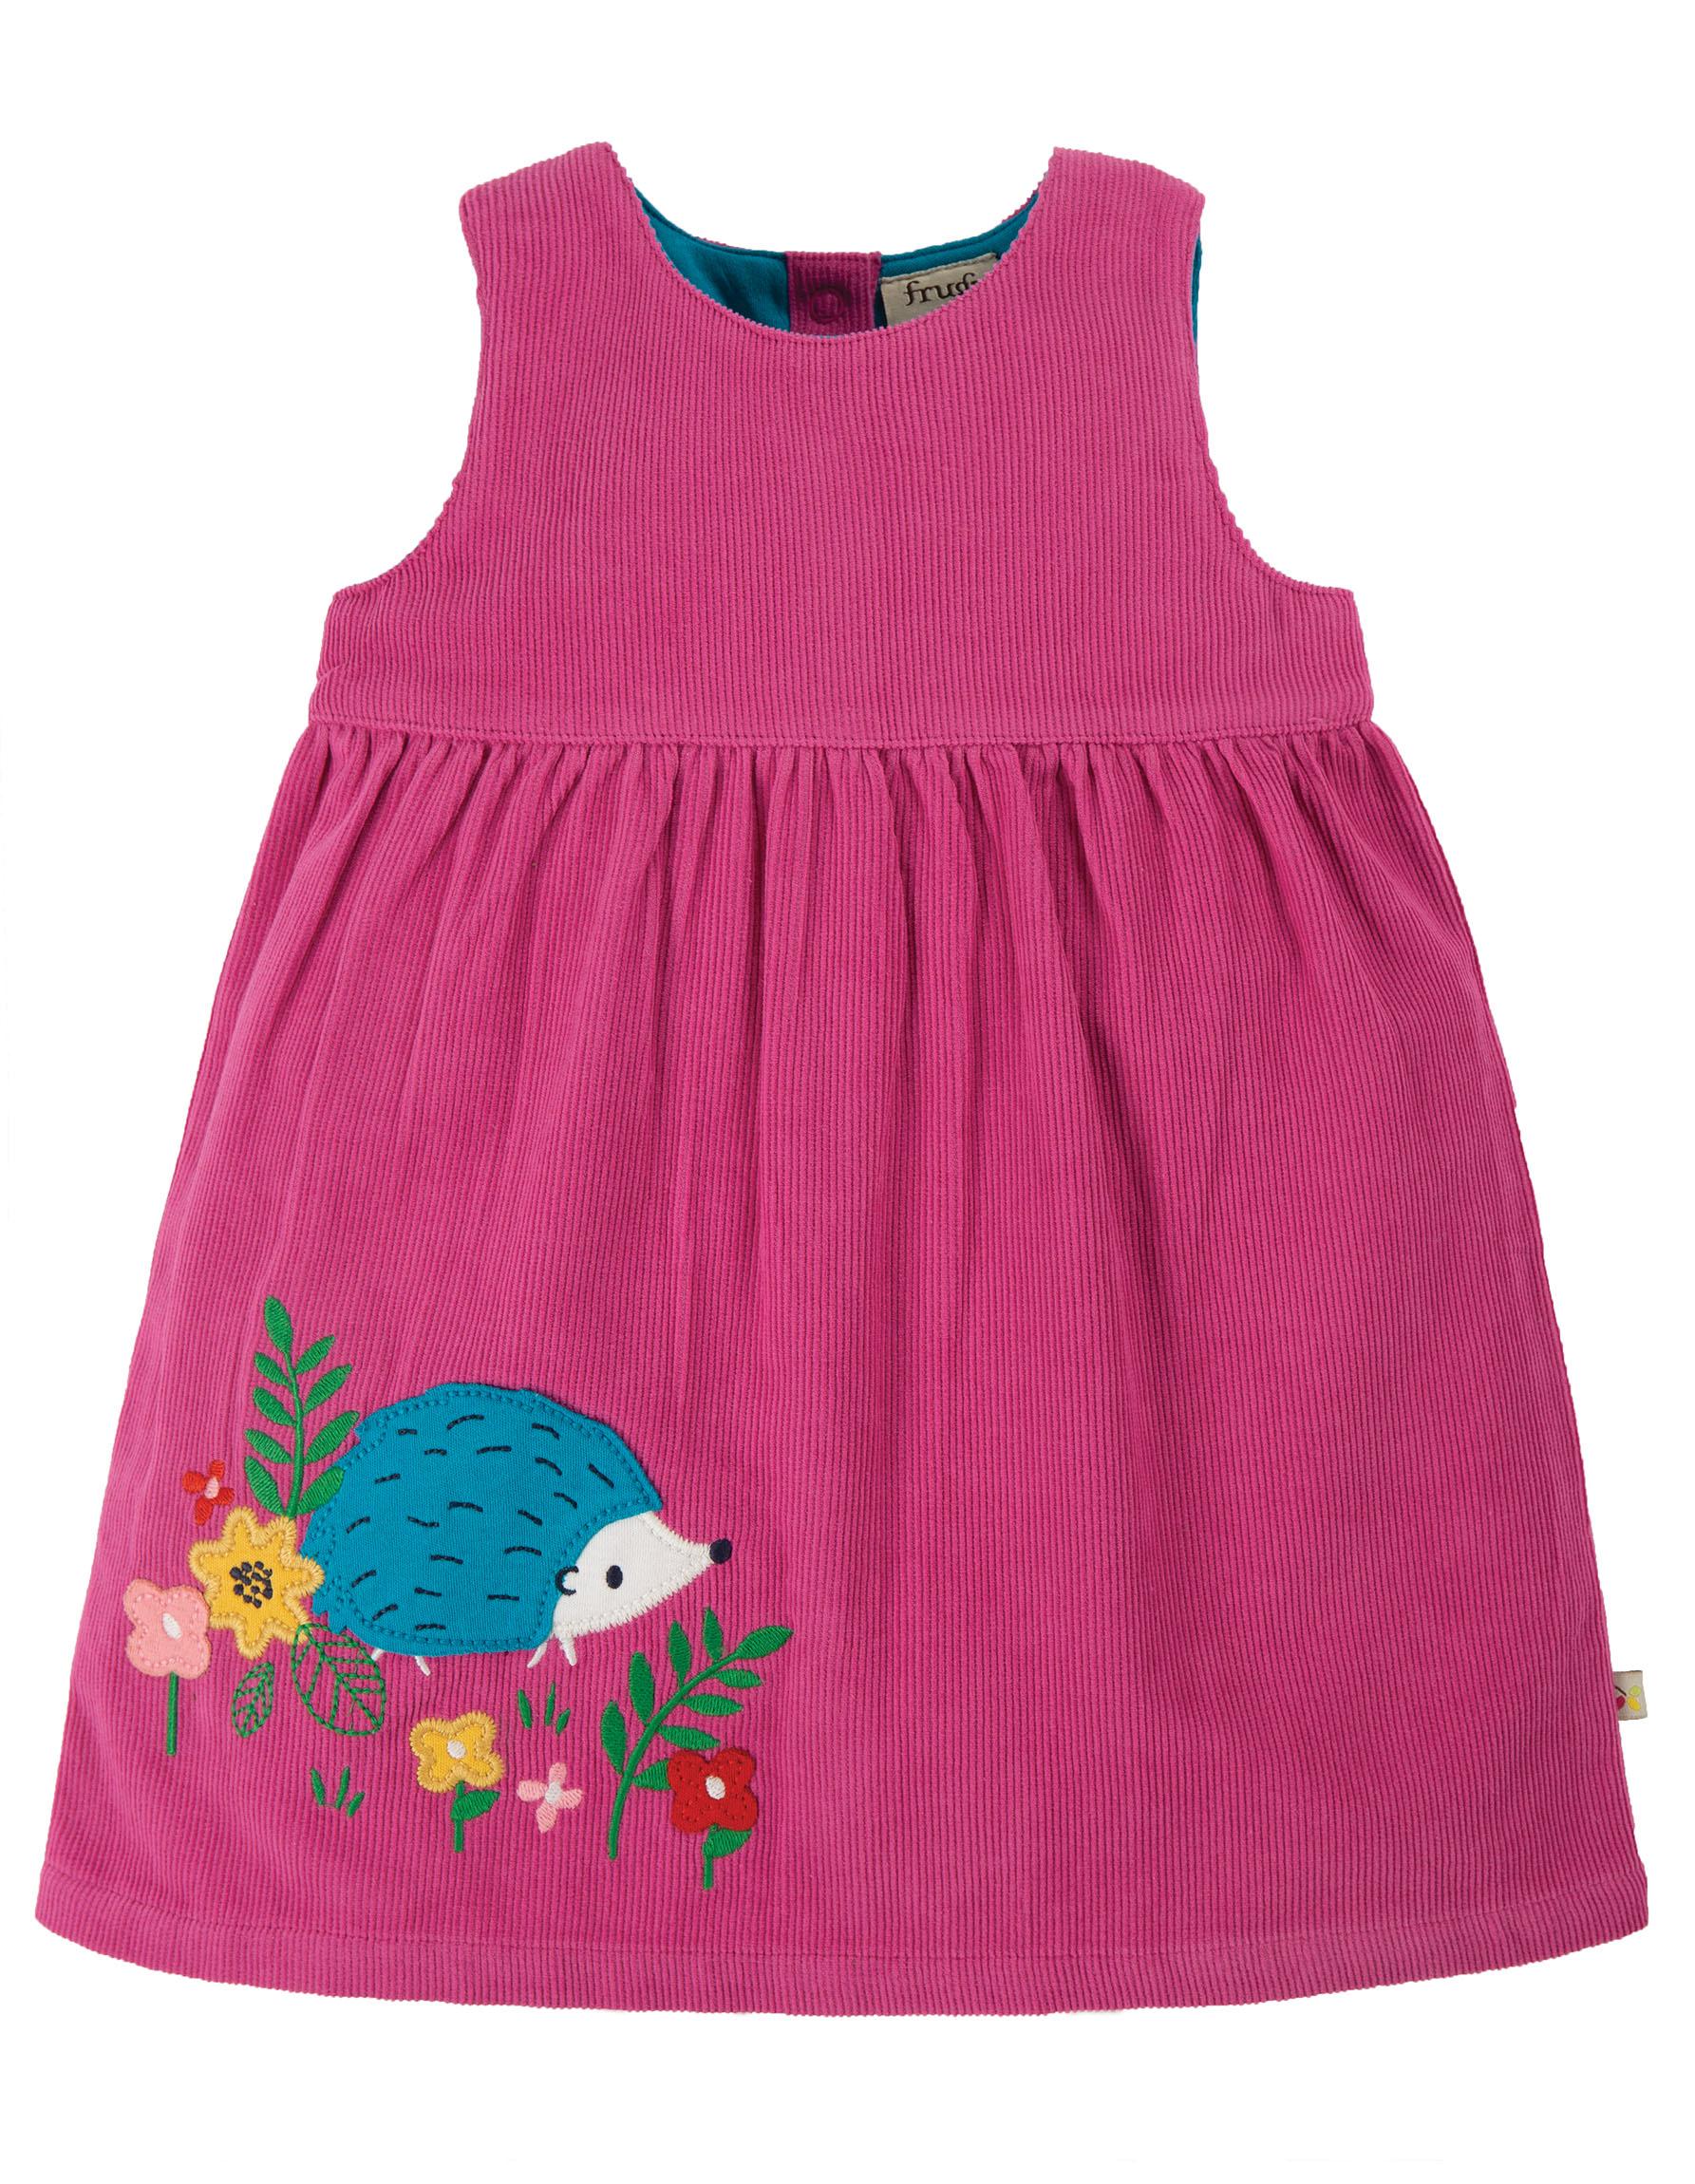 Frugi Lily Cord Dress, Foxglove/Hedgehog